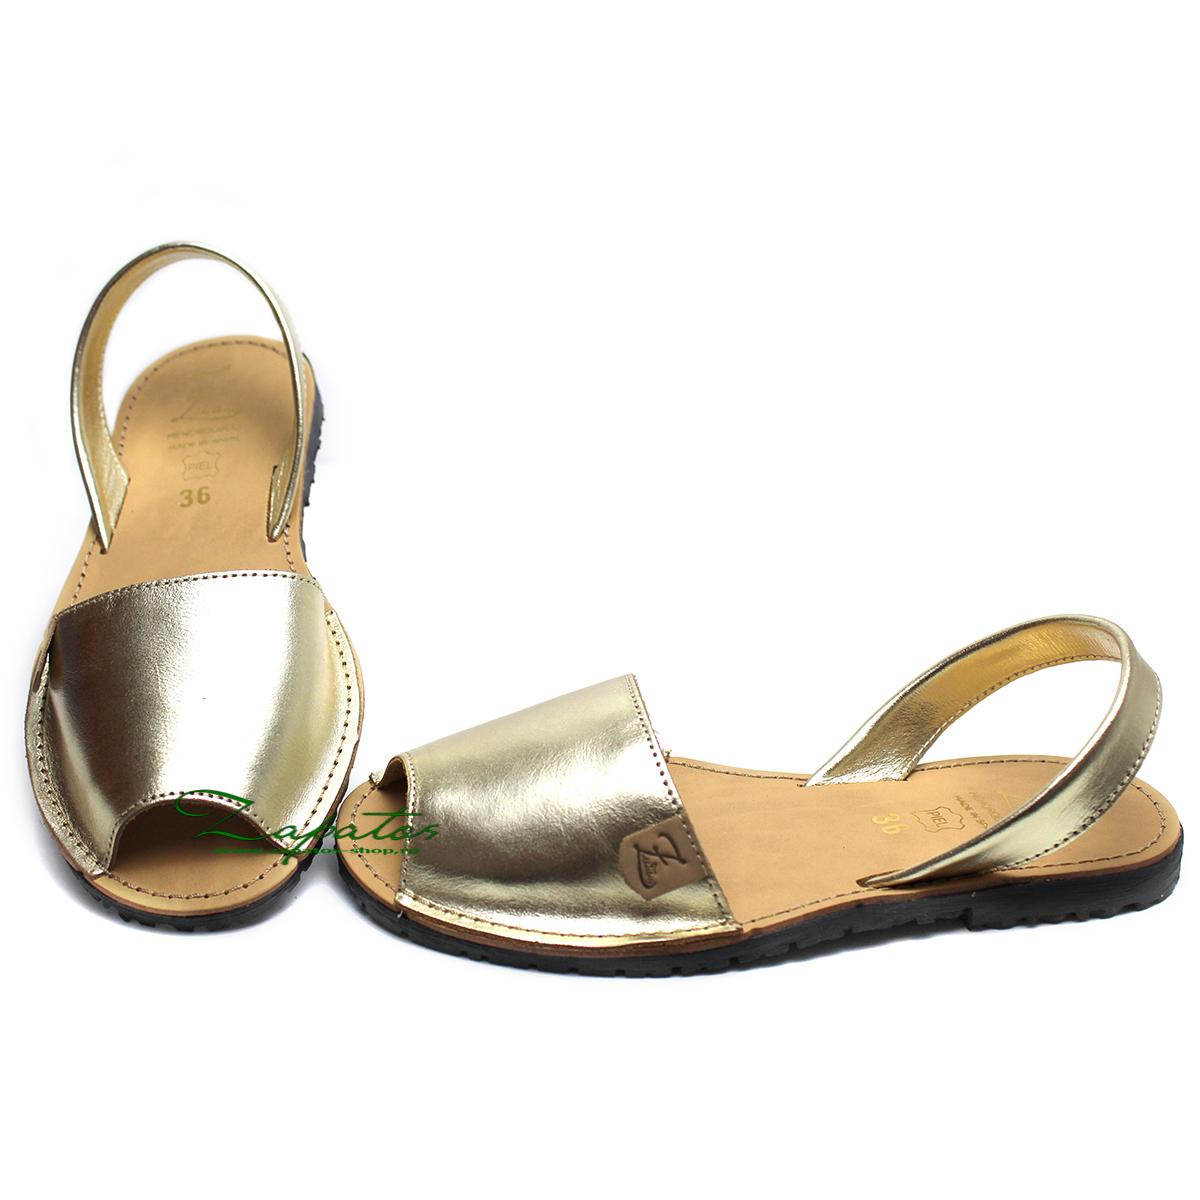 Абаркасы AB. Zapatos 3204 platino